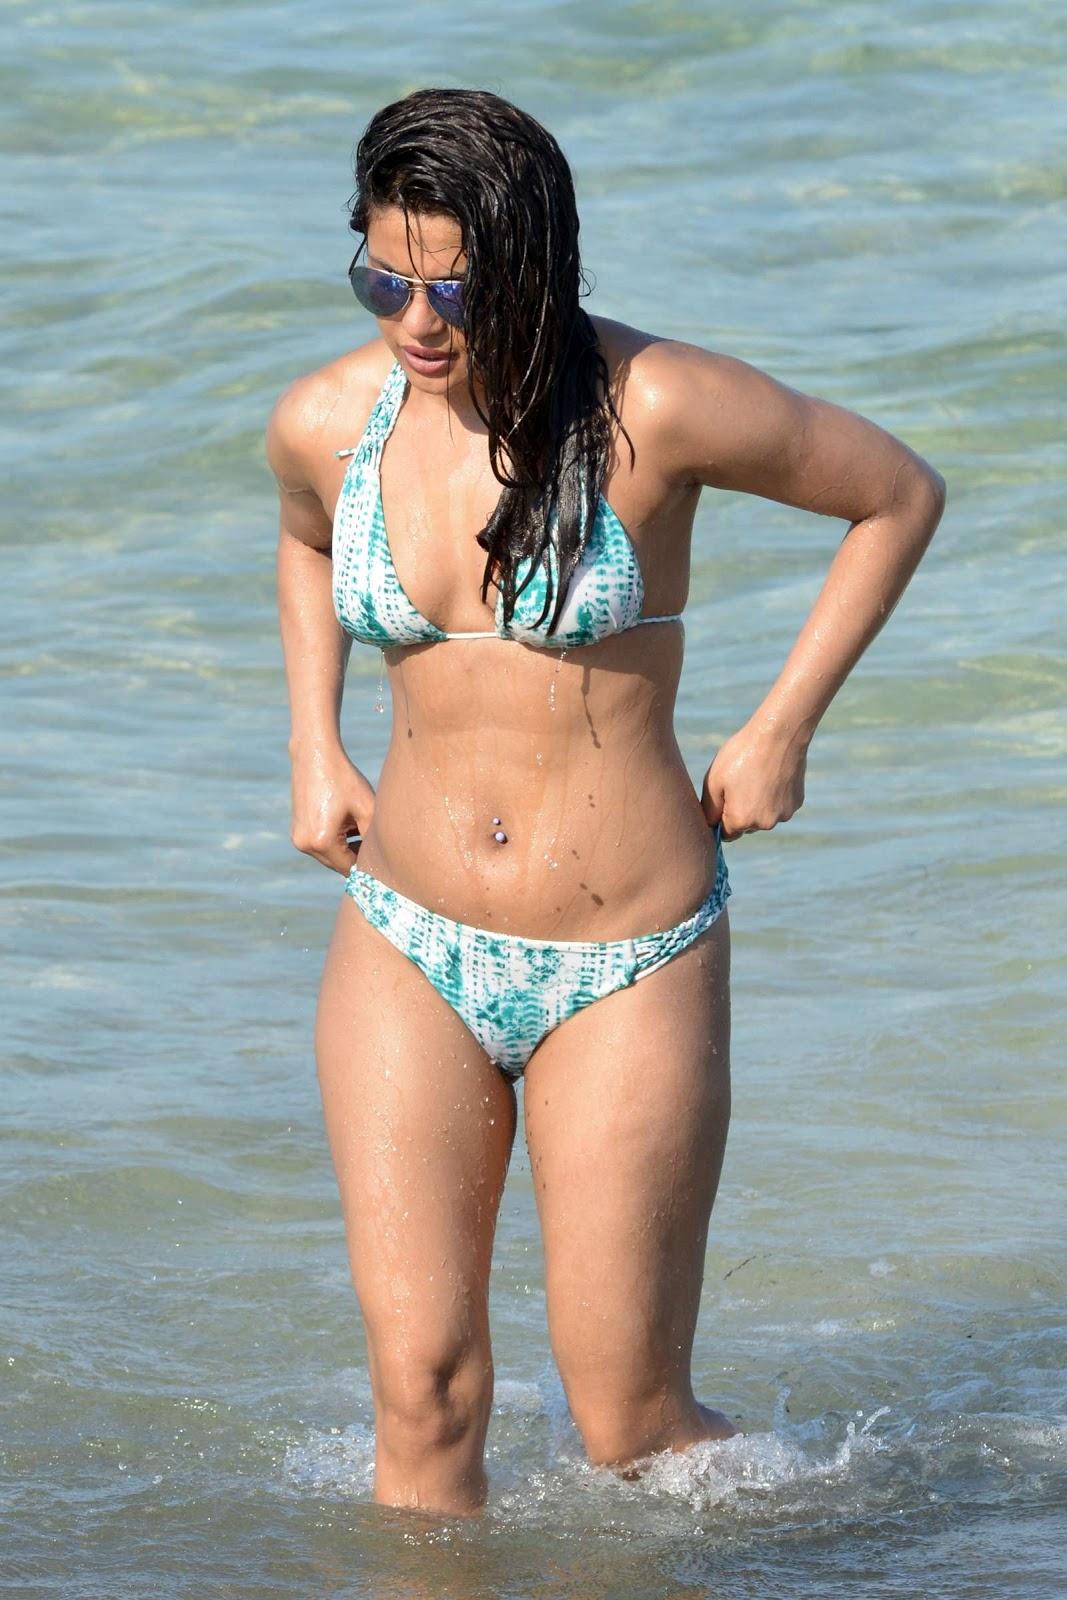 priyanka chopra sexy bikini photo